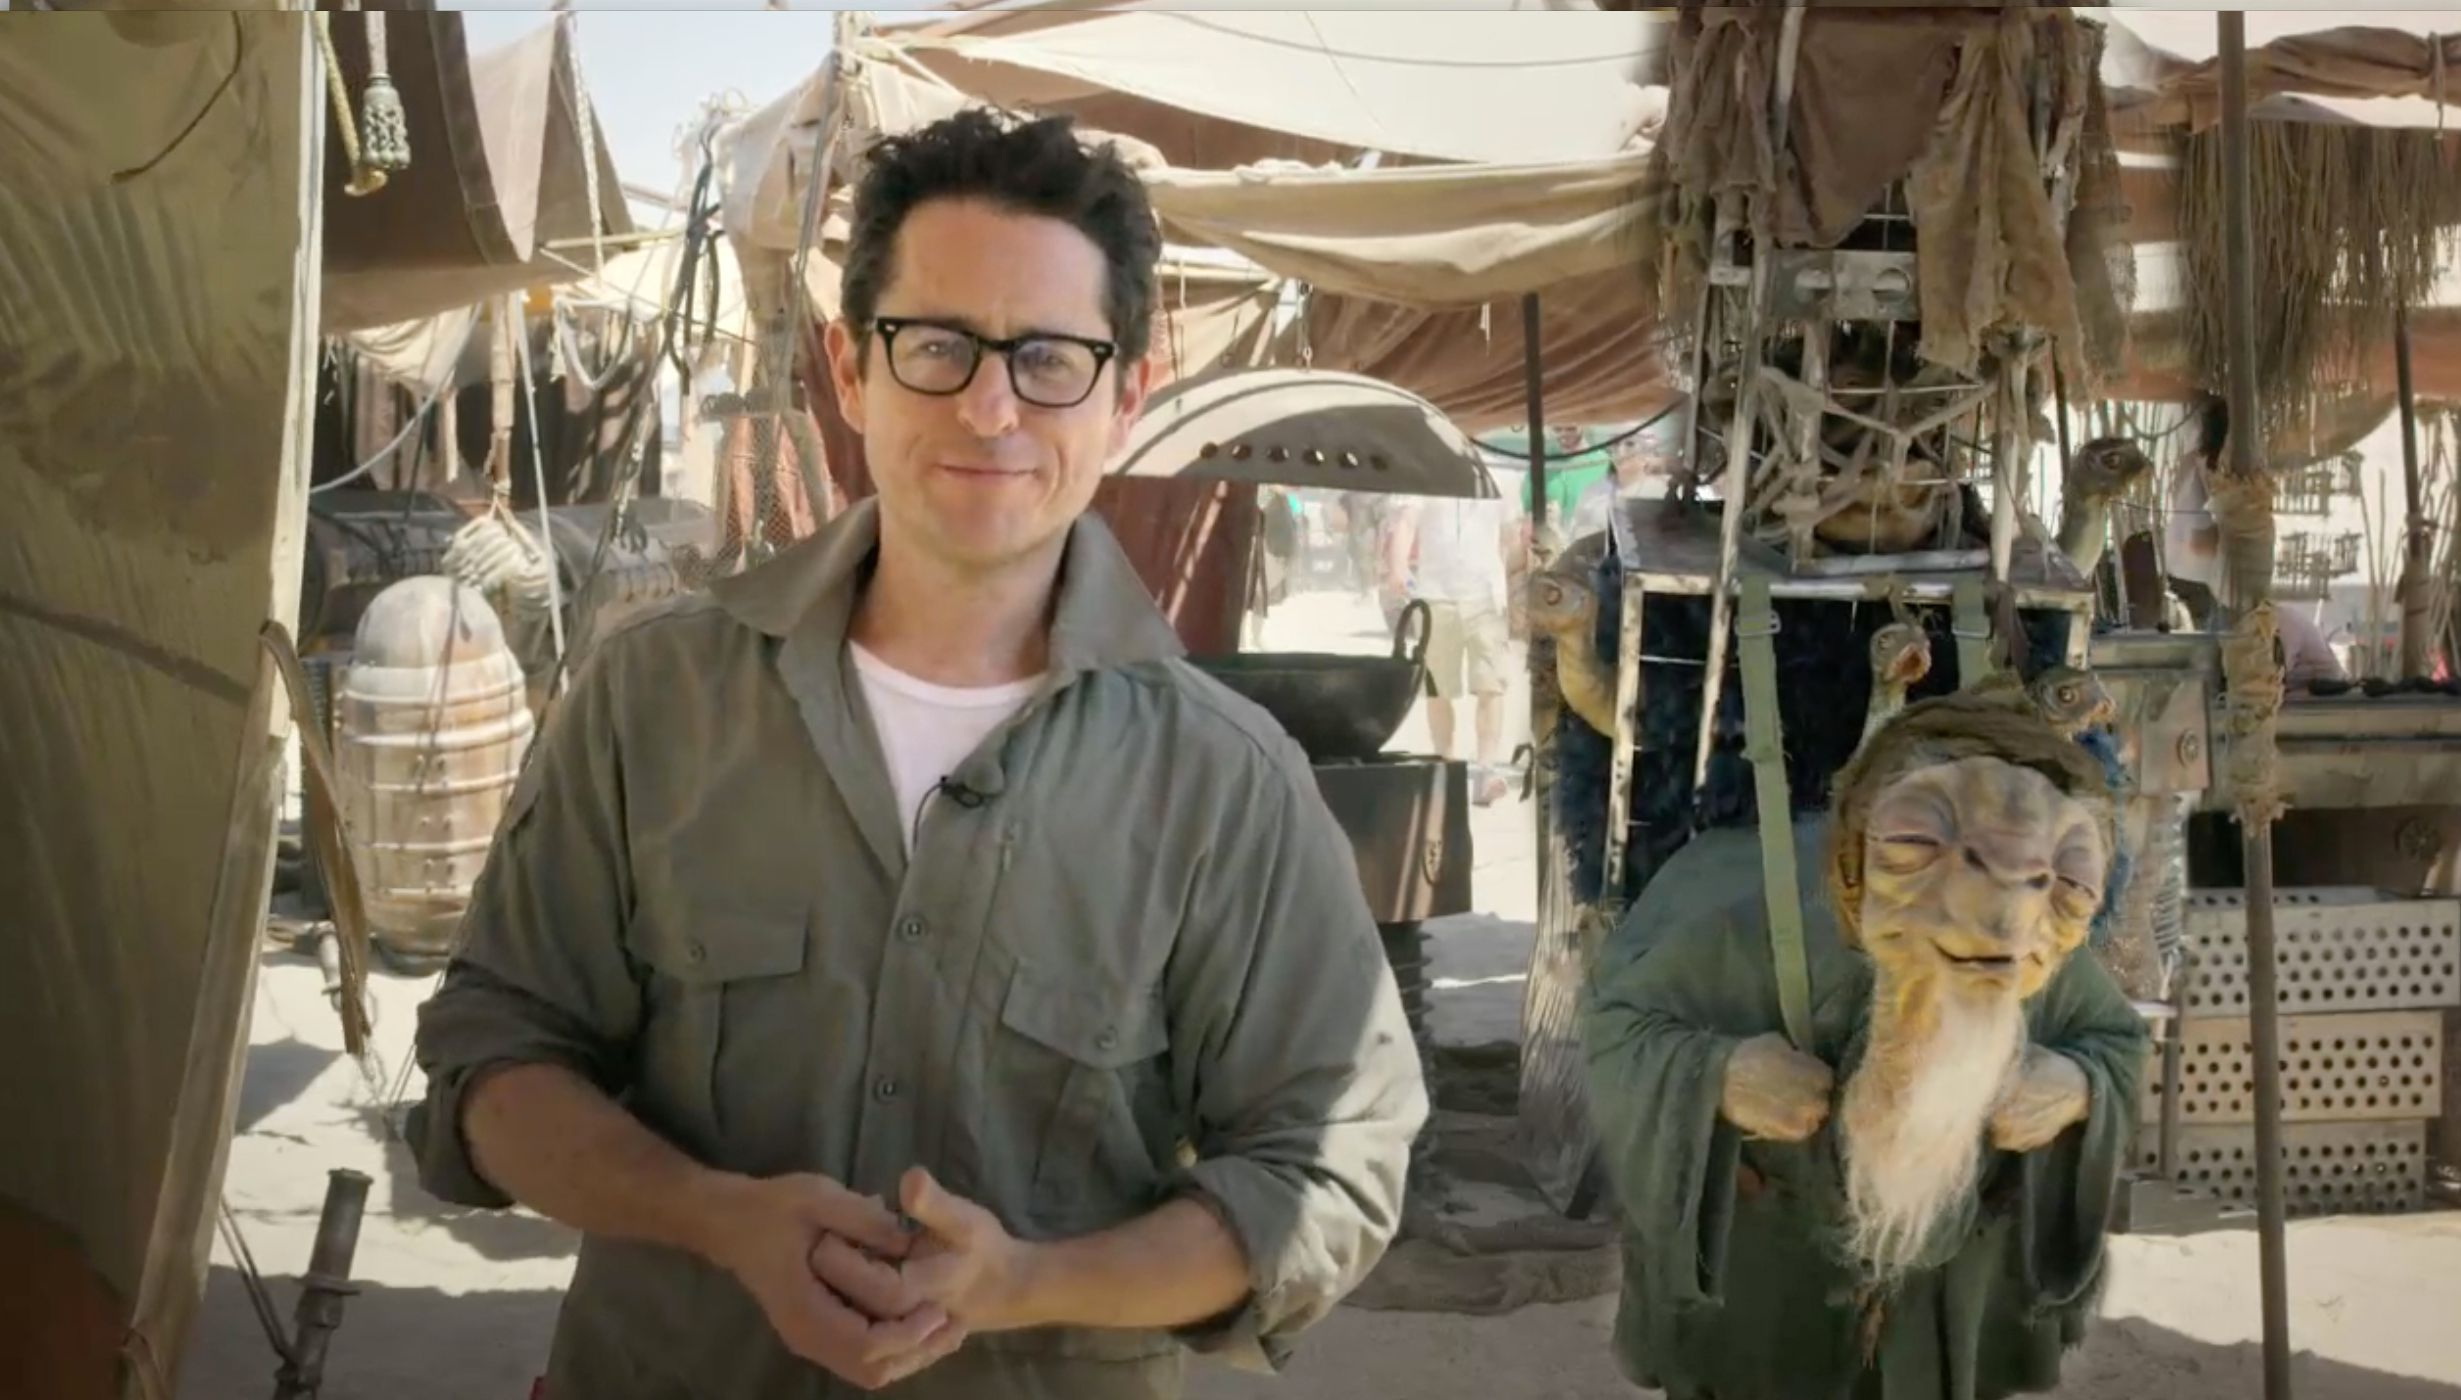 La Complex Season 1 Episode 7 Star Wars Episode Jj Abrams Alien